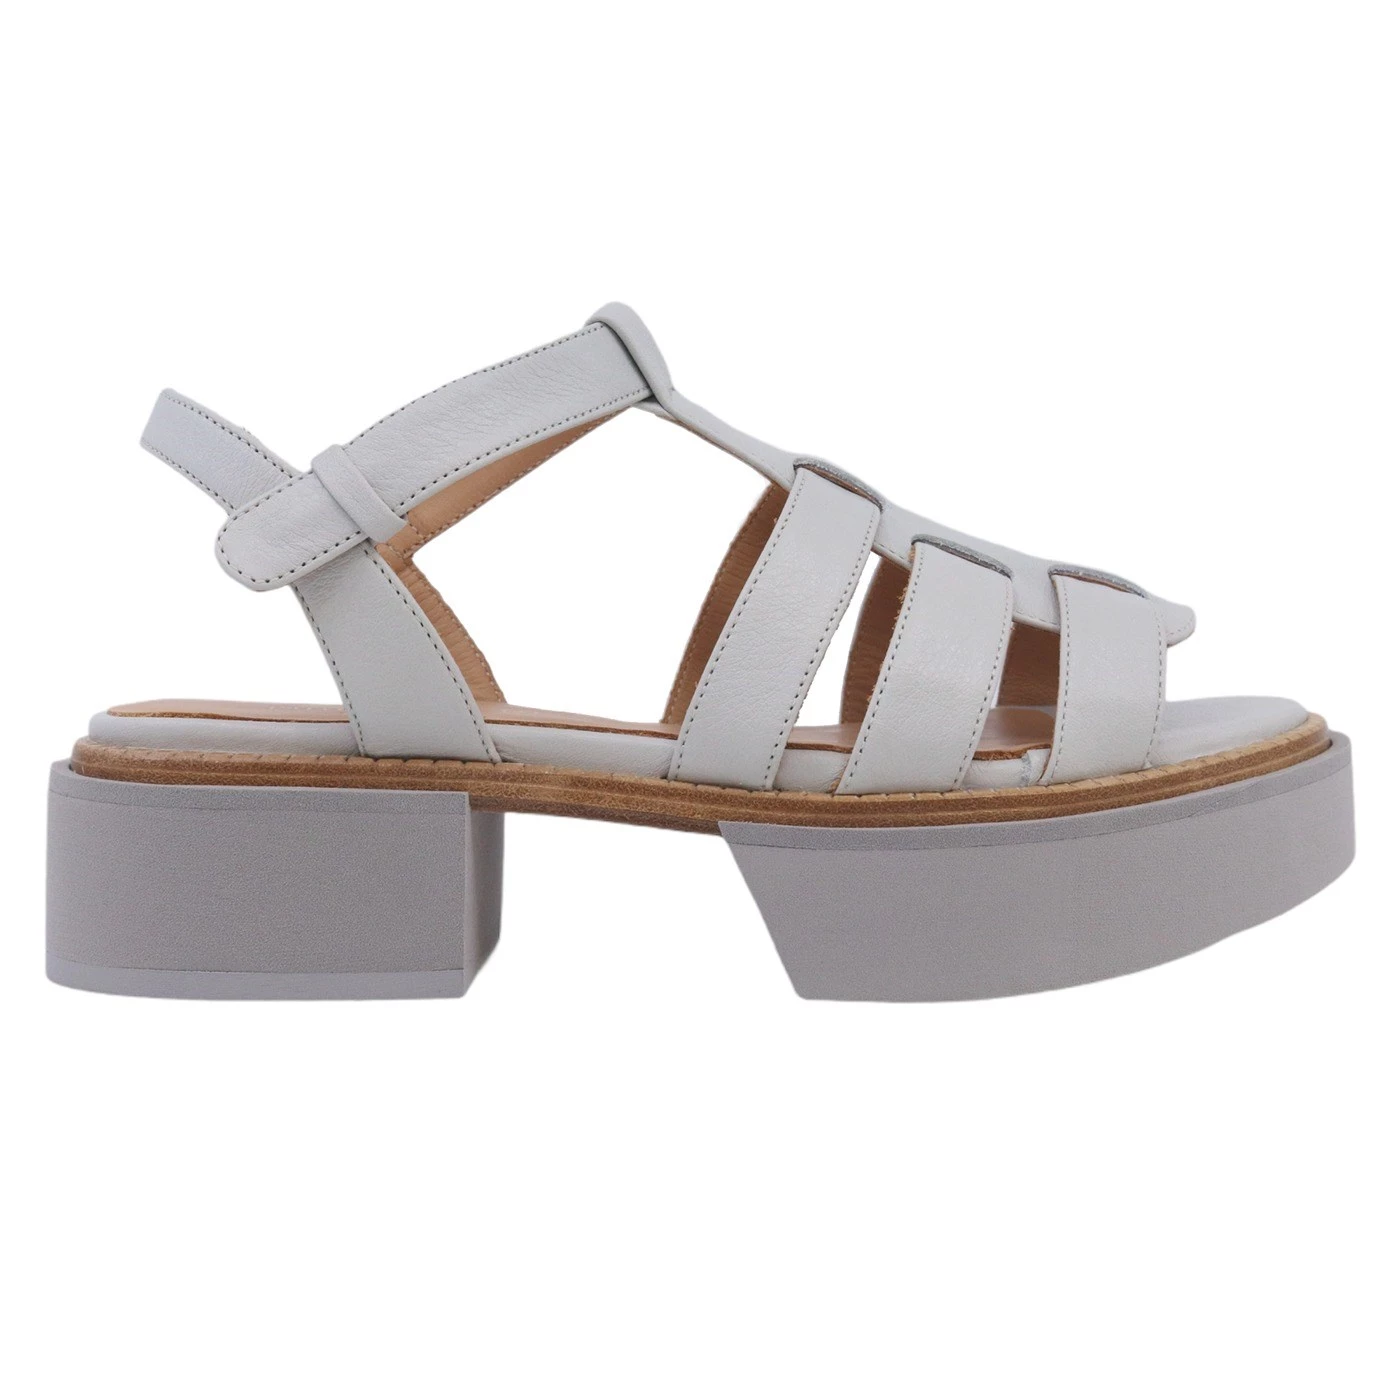 Paloma Barcelo Ivai 2072 sandalo da donna in pelle grigia